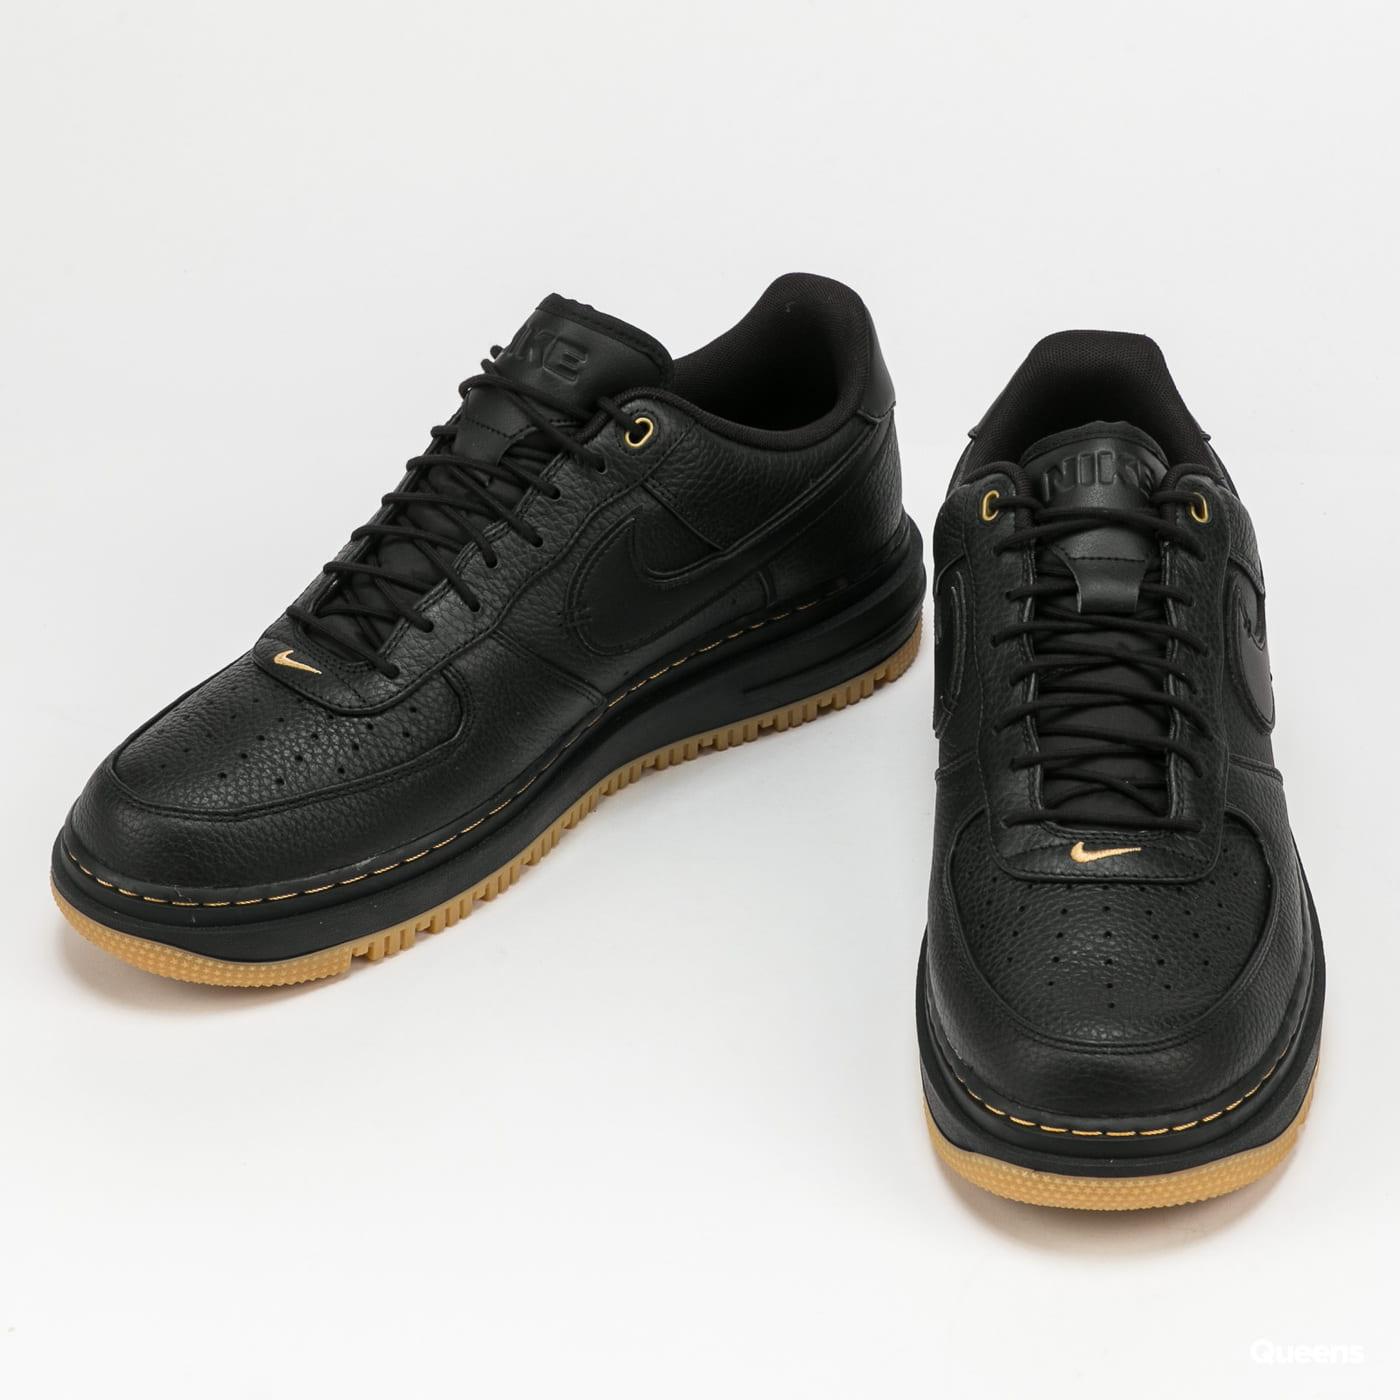 Nike Air Force 1 Luxe black / black - bucktan - gum - yellow